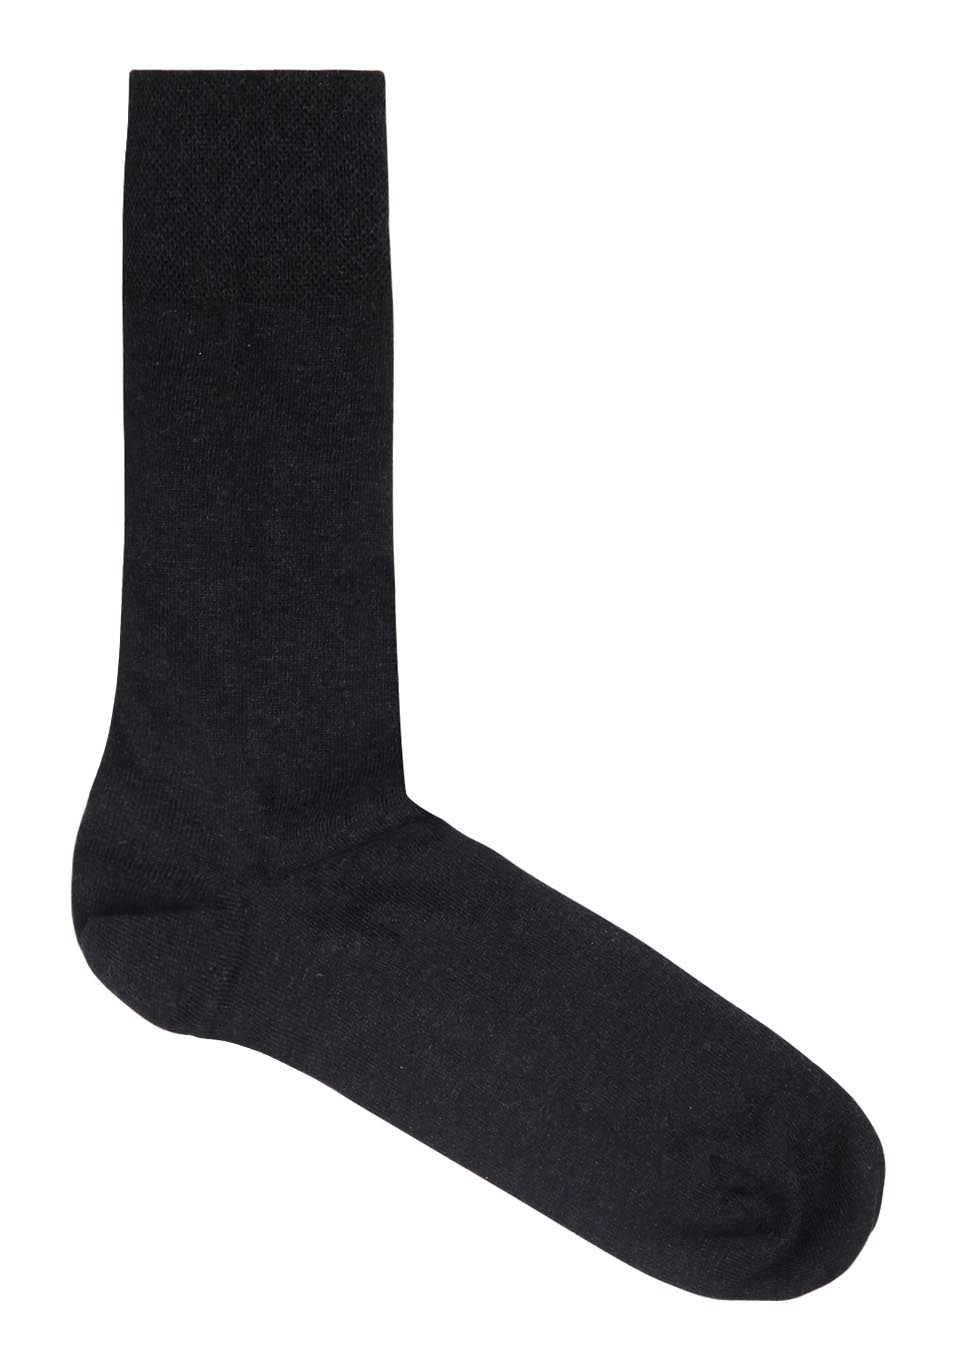 Sensitive charcoal stretch cotton socks - Falke